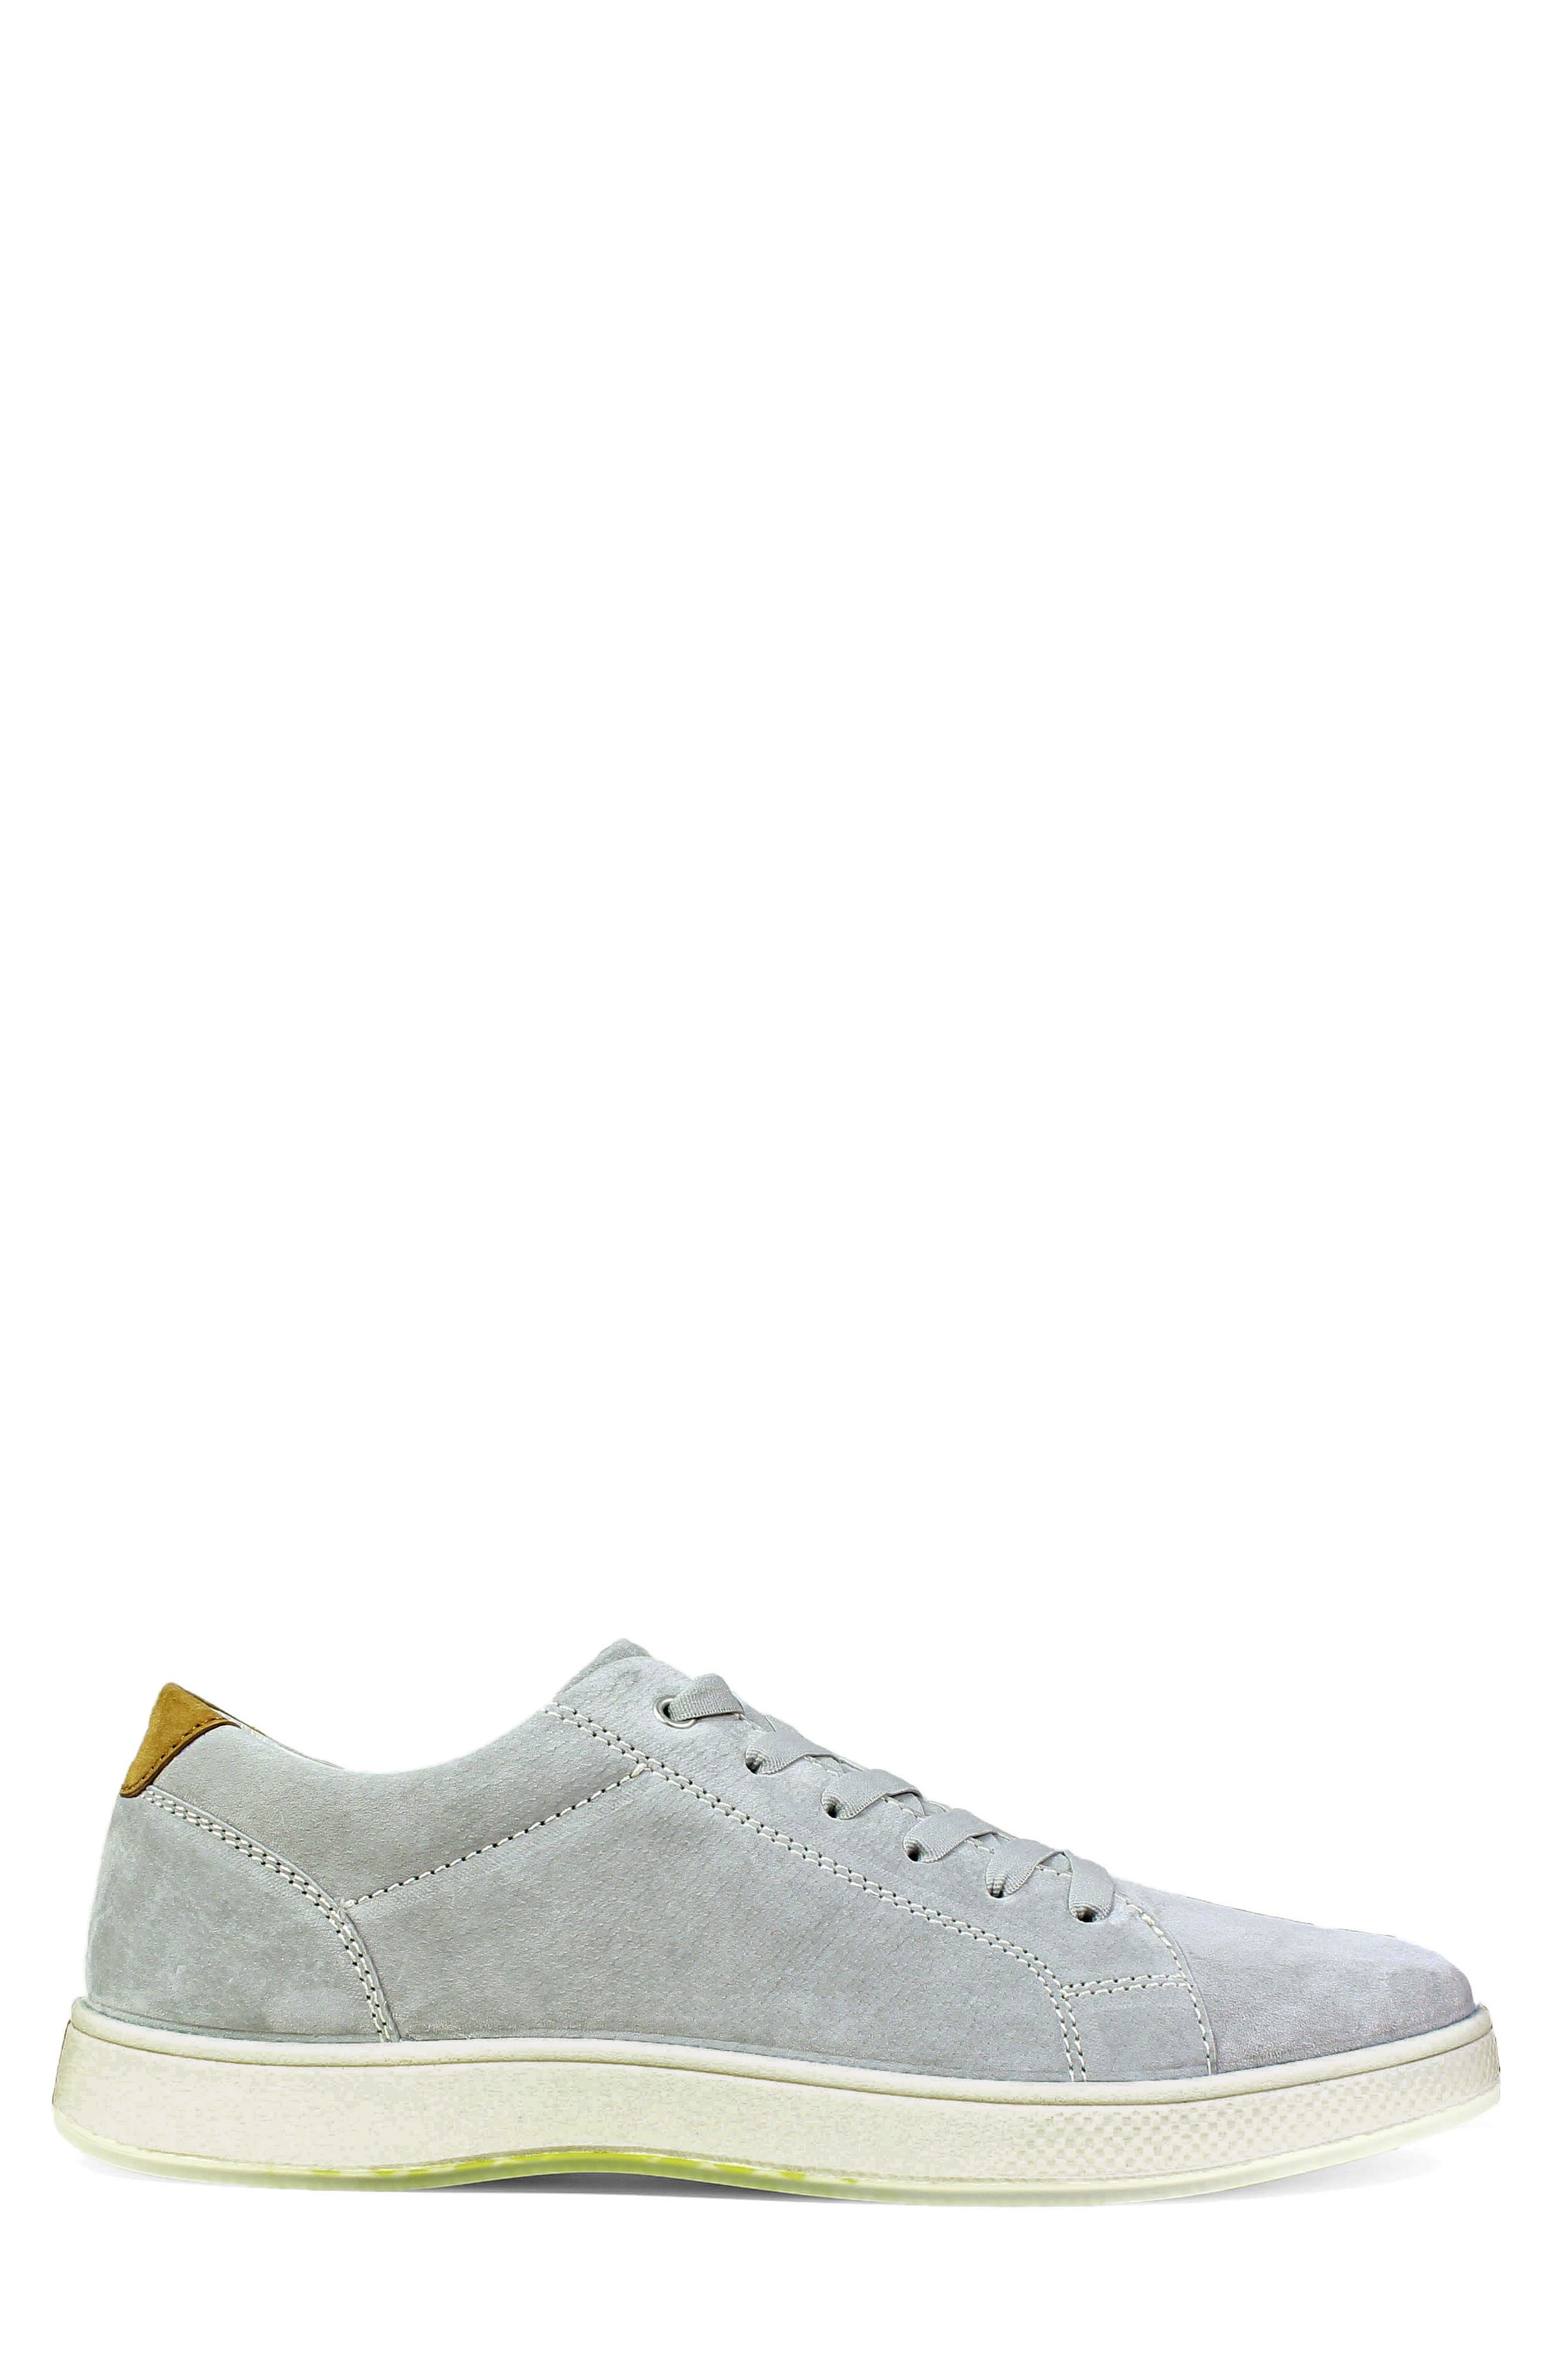 Alternate Image 3  - Florsheim Edge Low Top Sneaker (Men)